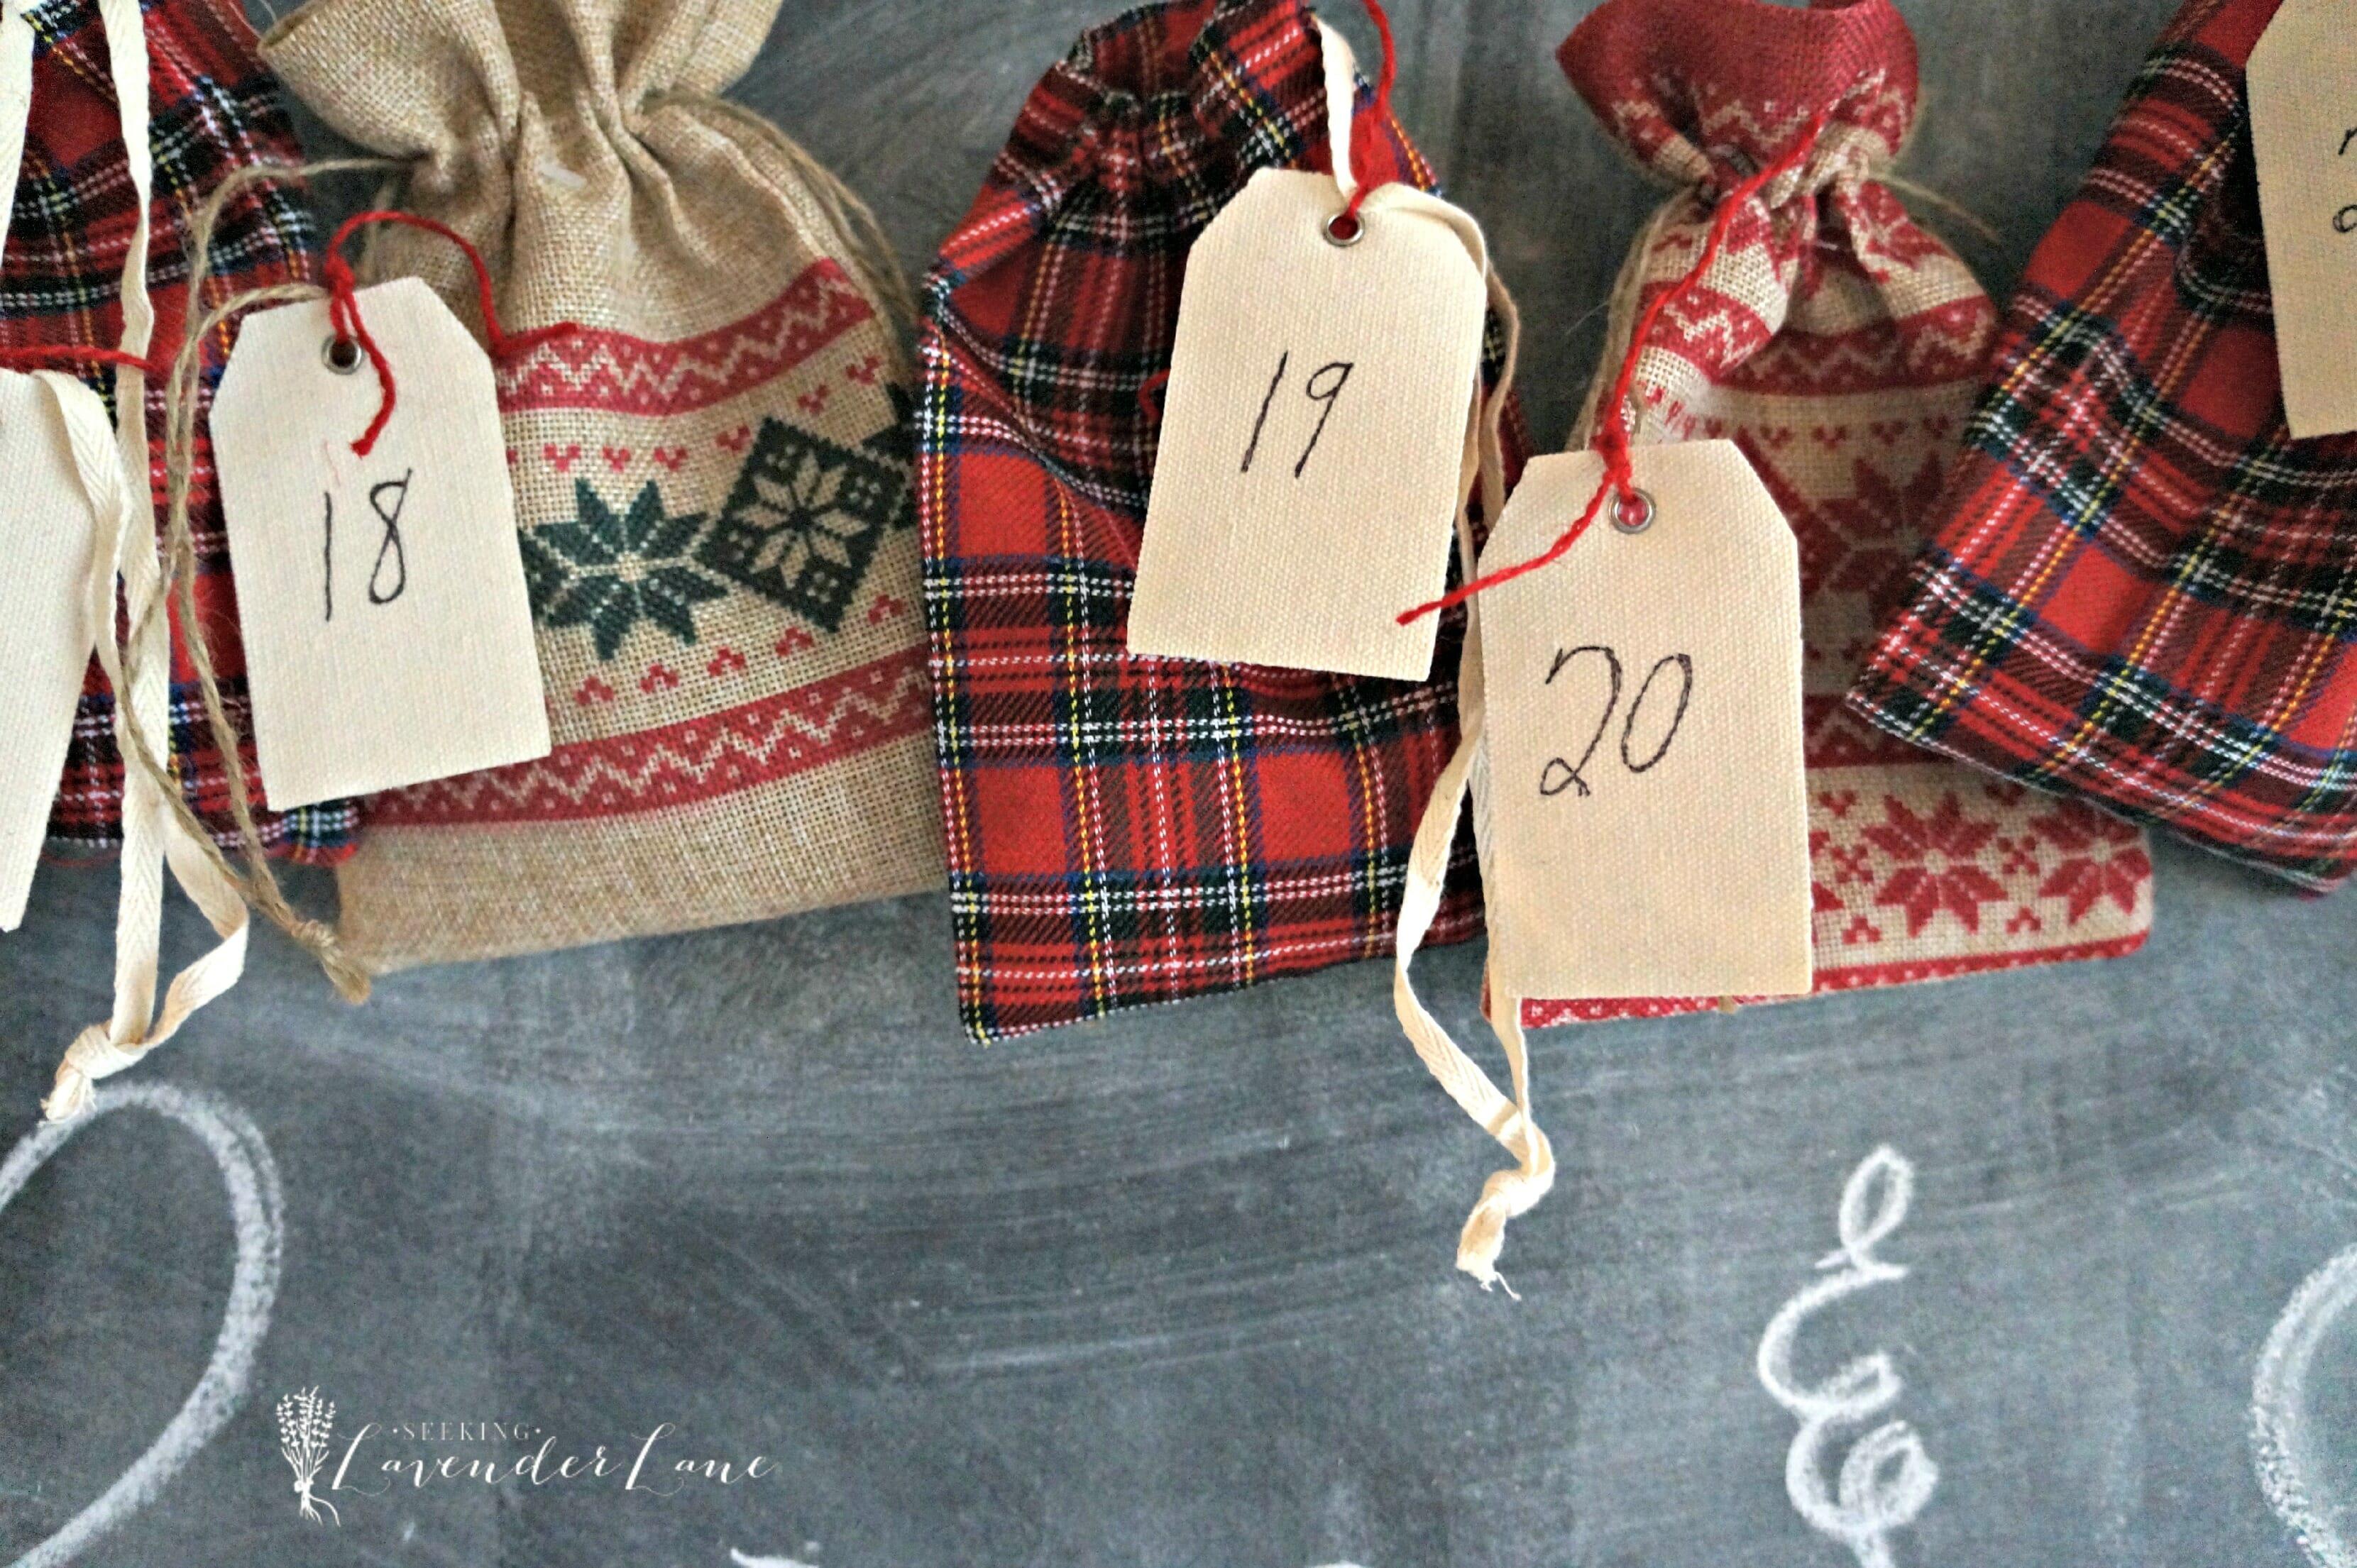 Advent Calendar burlap bags